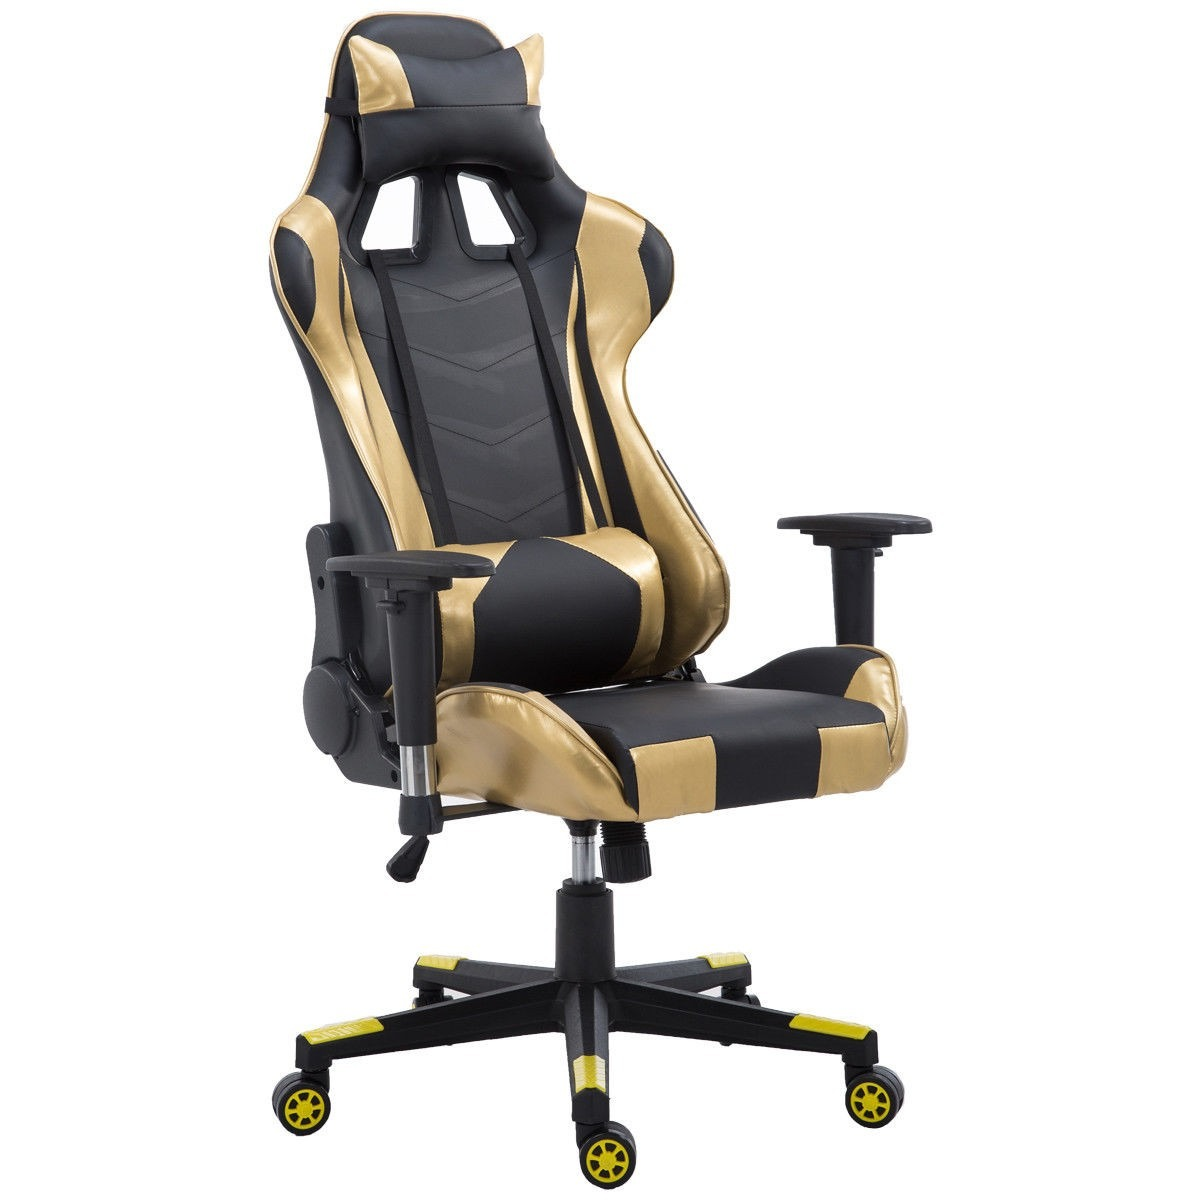 Silla ergonomica para oficina moderna escritorio oro for Silla de escritorio precio